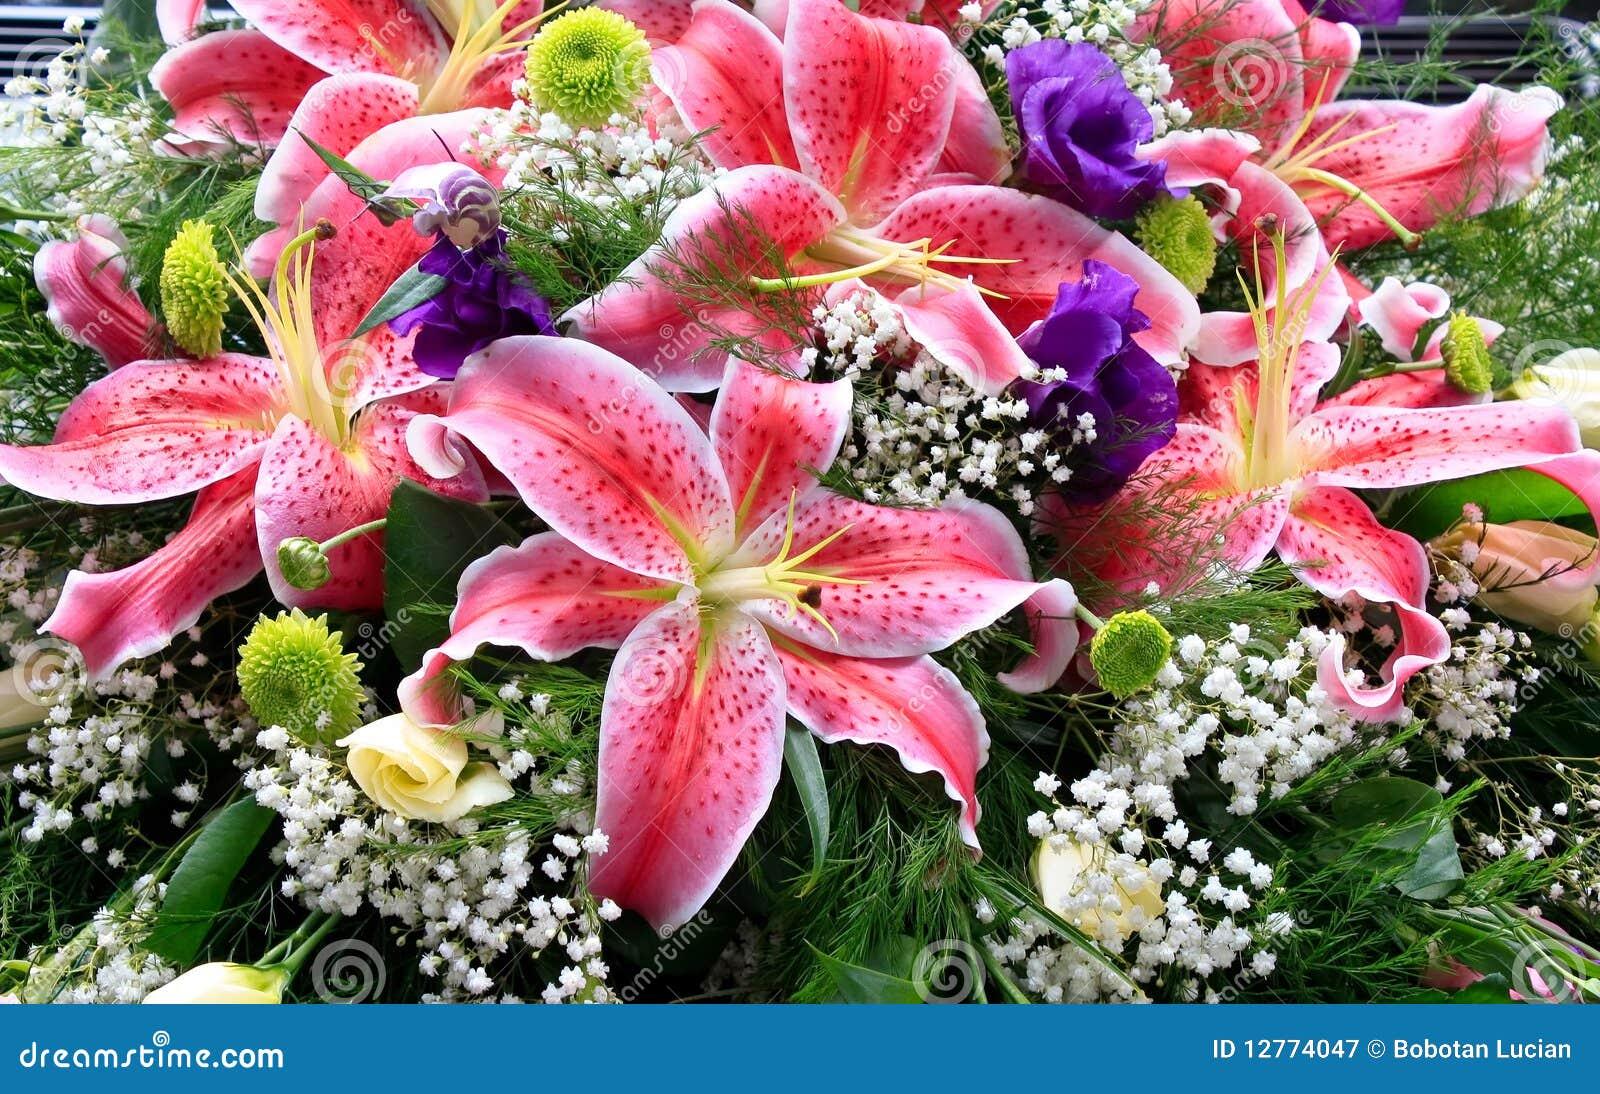 Lily flowers bouquet stock image. Image of arrangement - 12774047